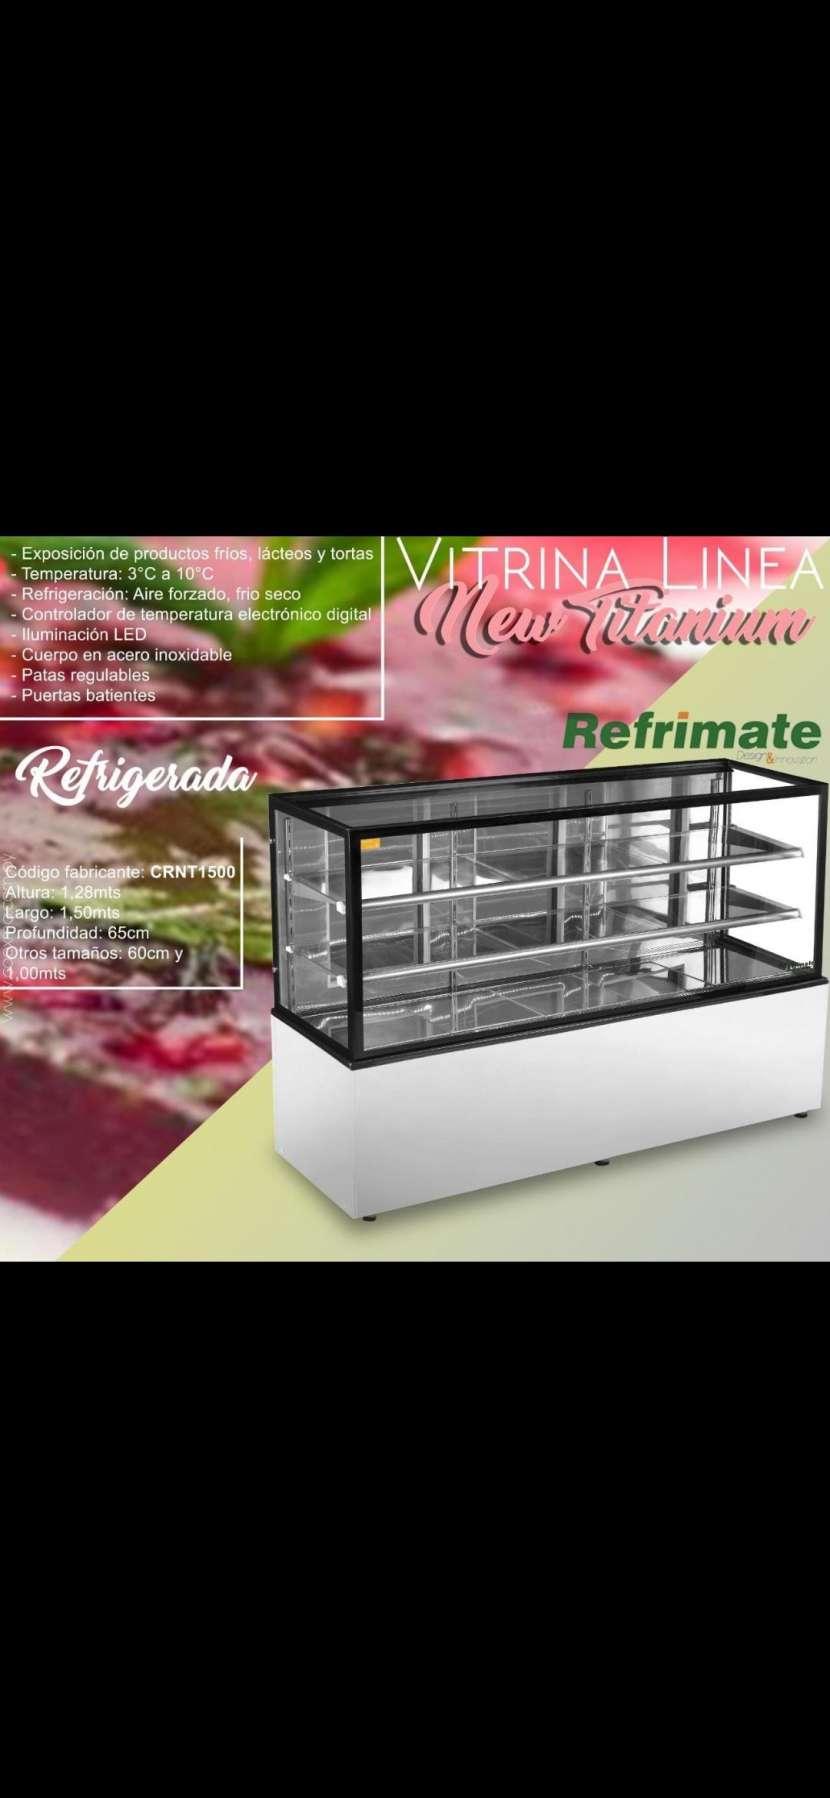 Vitrina refrigerada Refrimate - 0